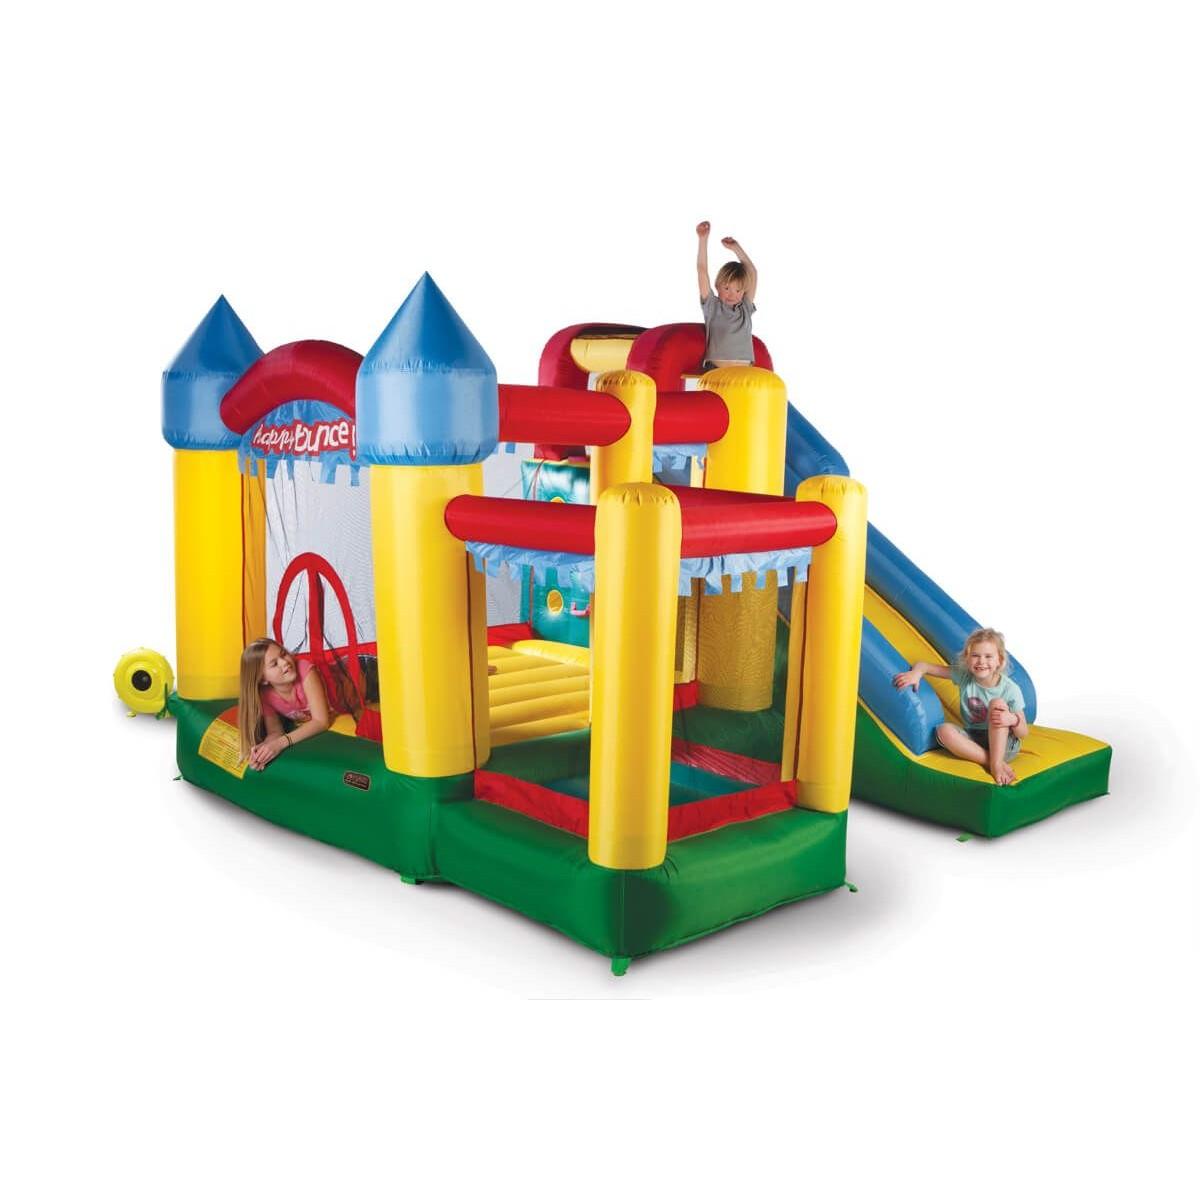 Gonfiabile Fun palace 6 in 1